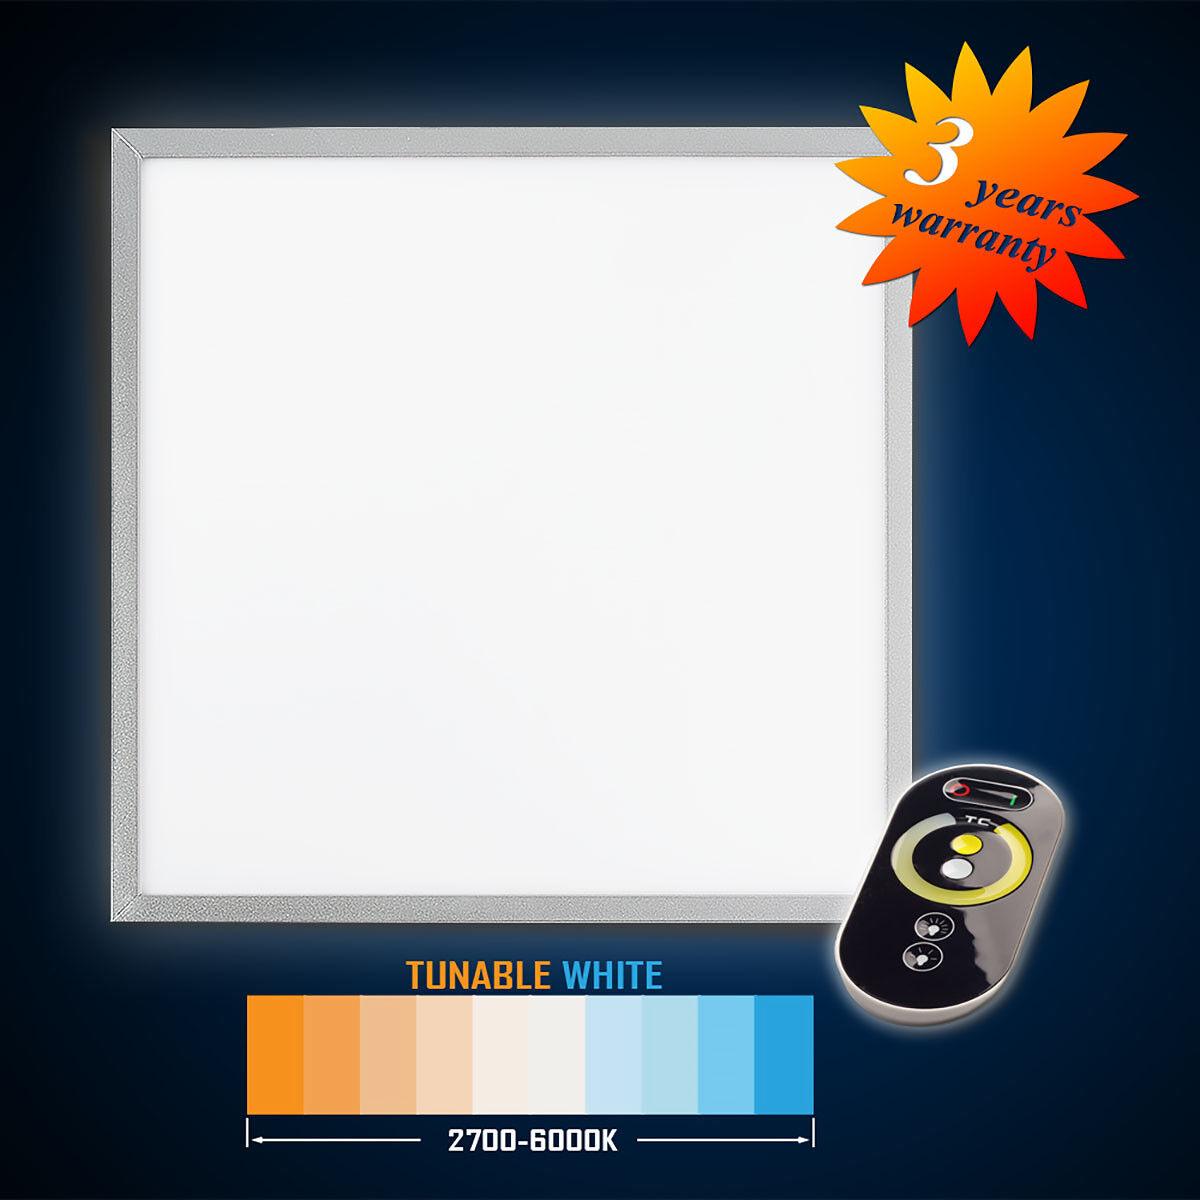 vendita calda online Pannello LED LED LED 62x62 42w (S) tunable bianca (3000-5000k) Dimmerabile  consegna gratuita